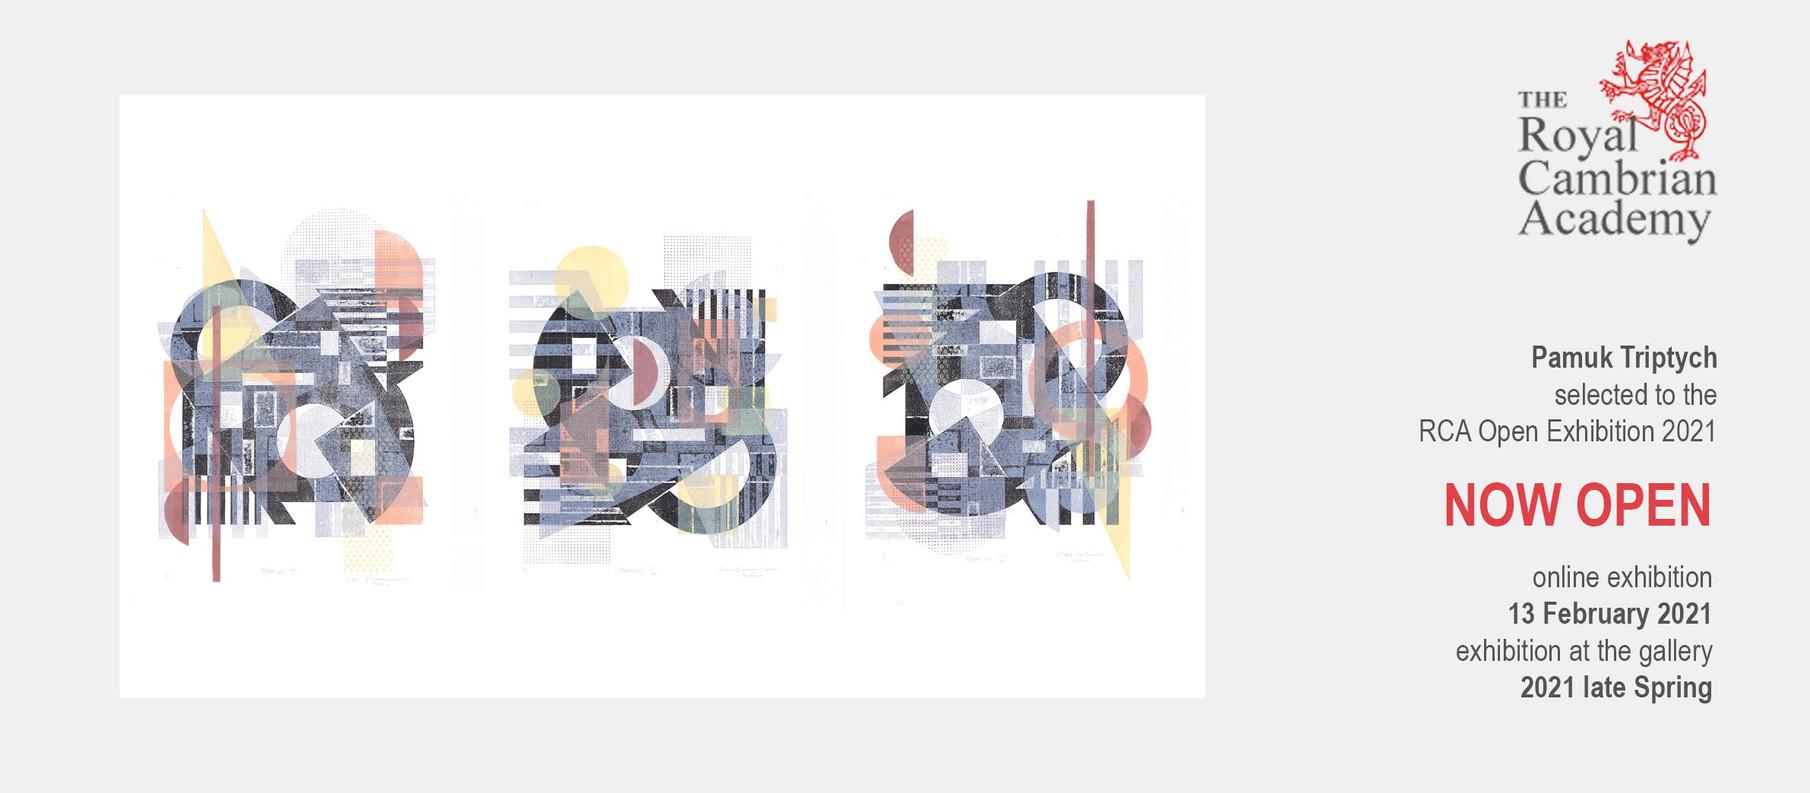 2020 Pamuk Triptych PR RCA - NEWS - ONLI